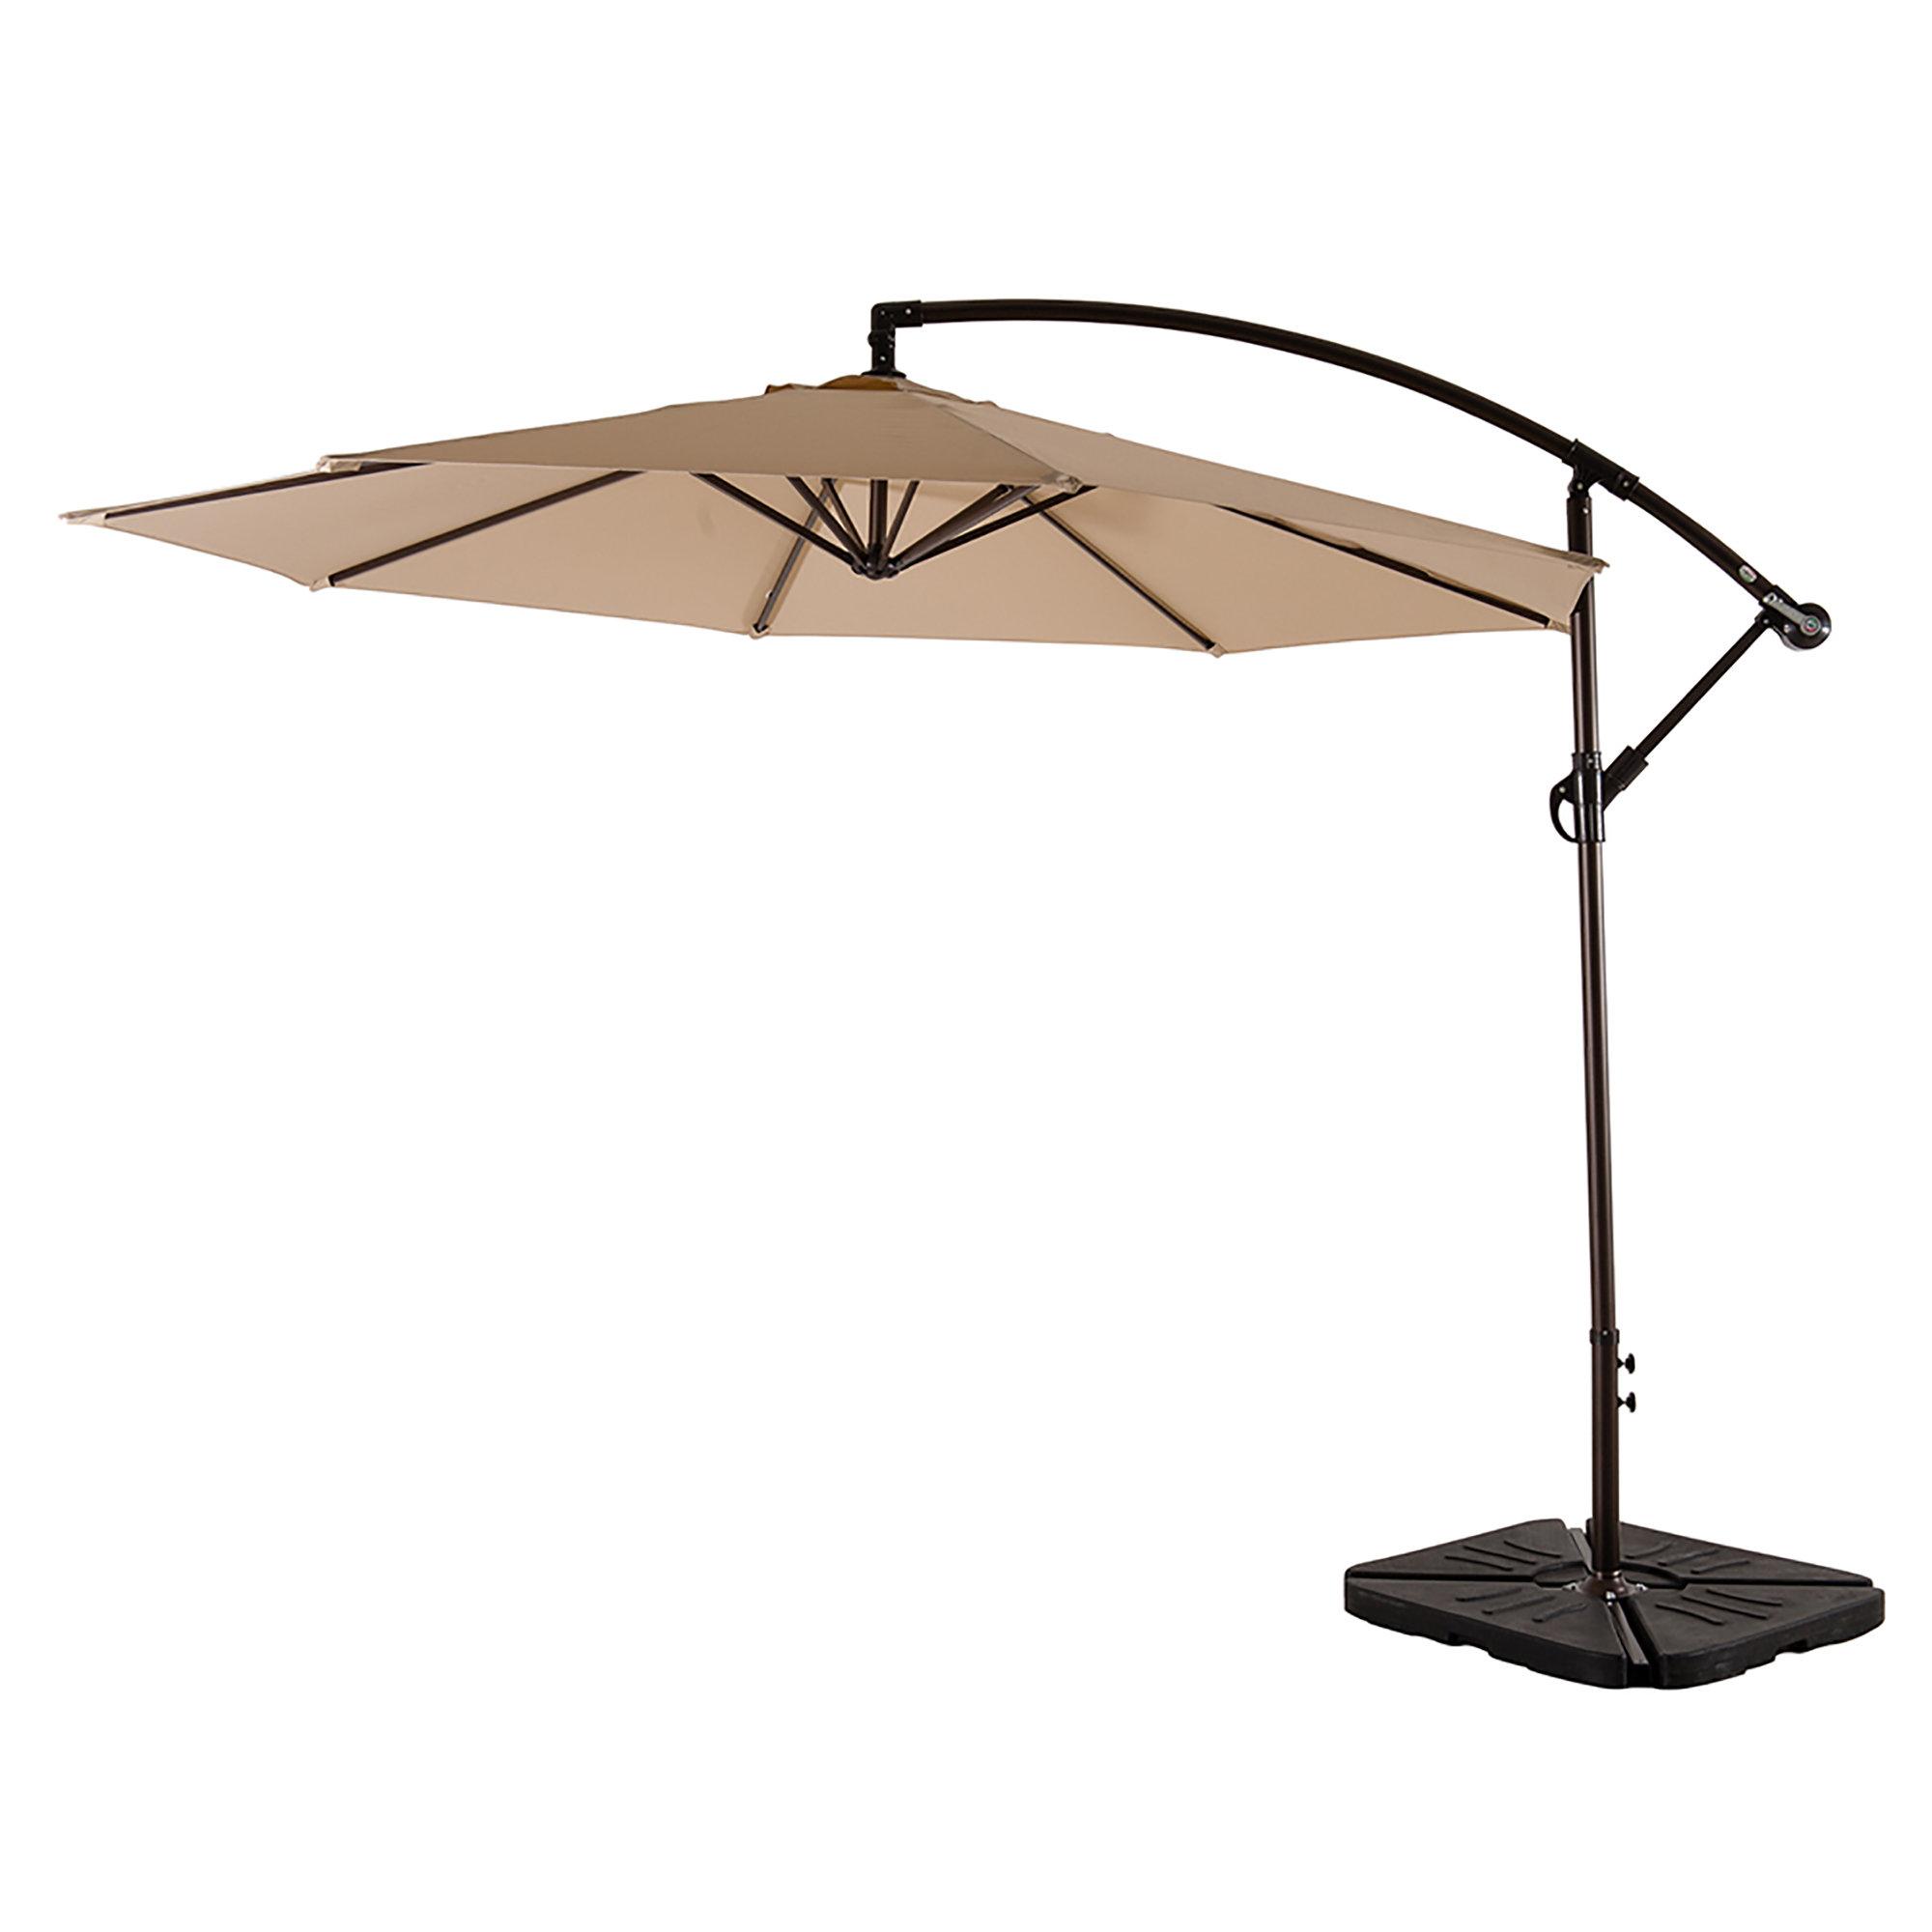 Kizzie Market 10' Cantilever Umbrella Regarding 2020 Iyanna Cantilever Umbrellas (View 2 of 20)